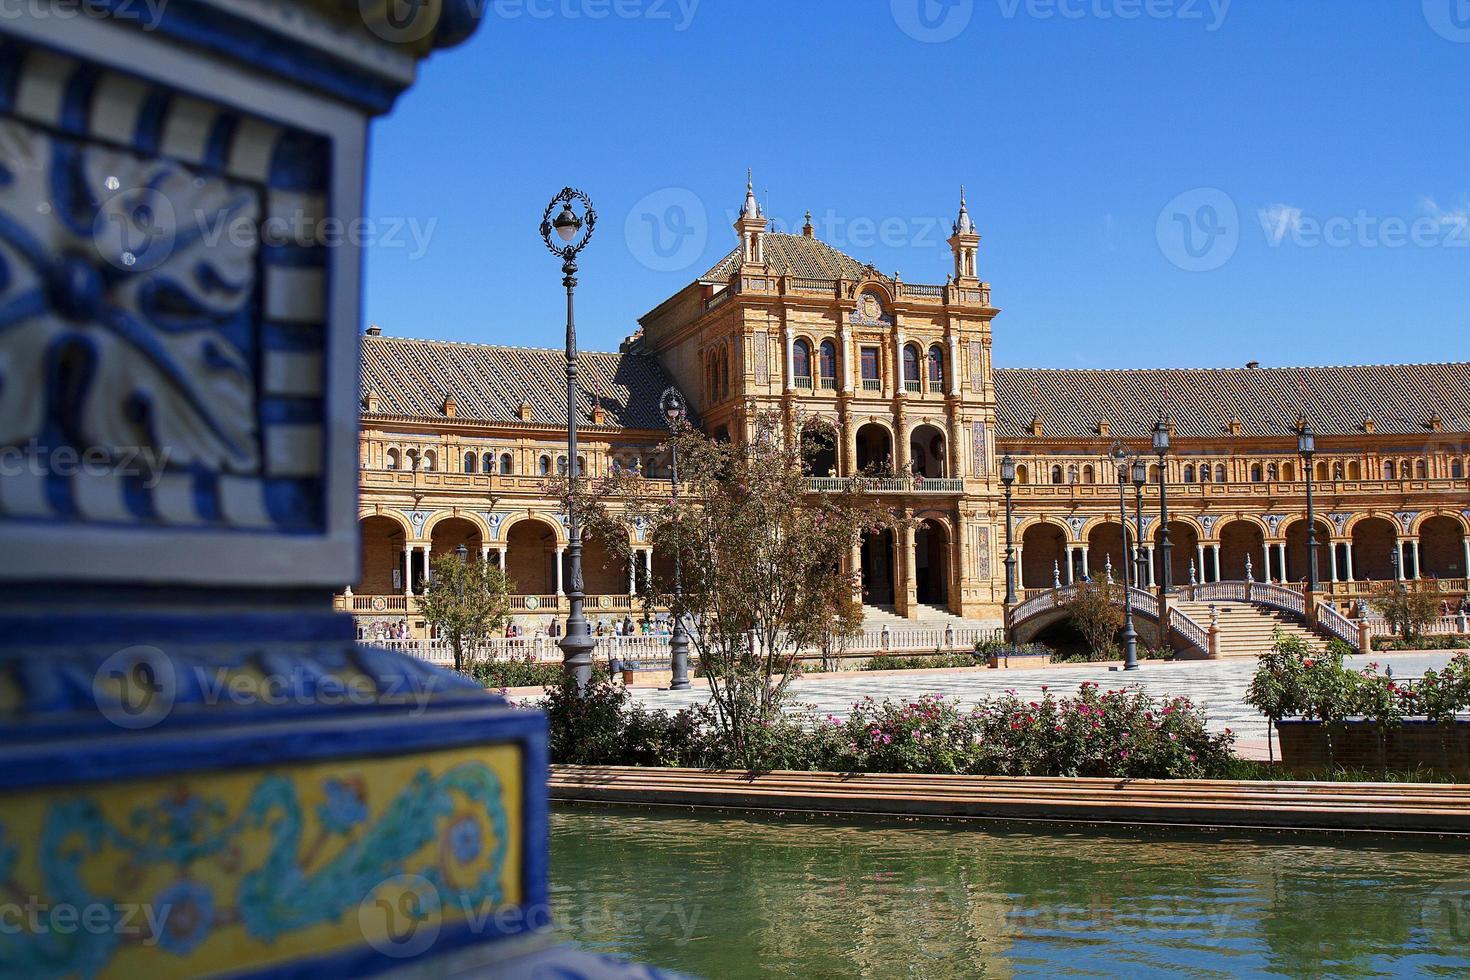 Palast und Keramik in Plaza de España, Sevilla. foto